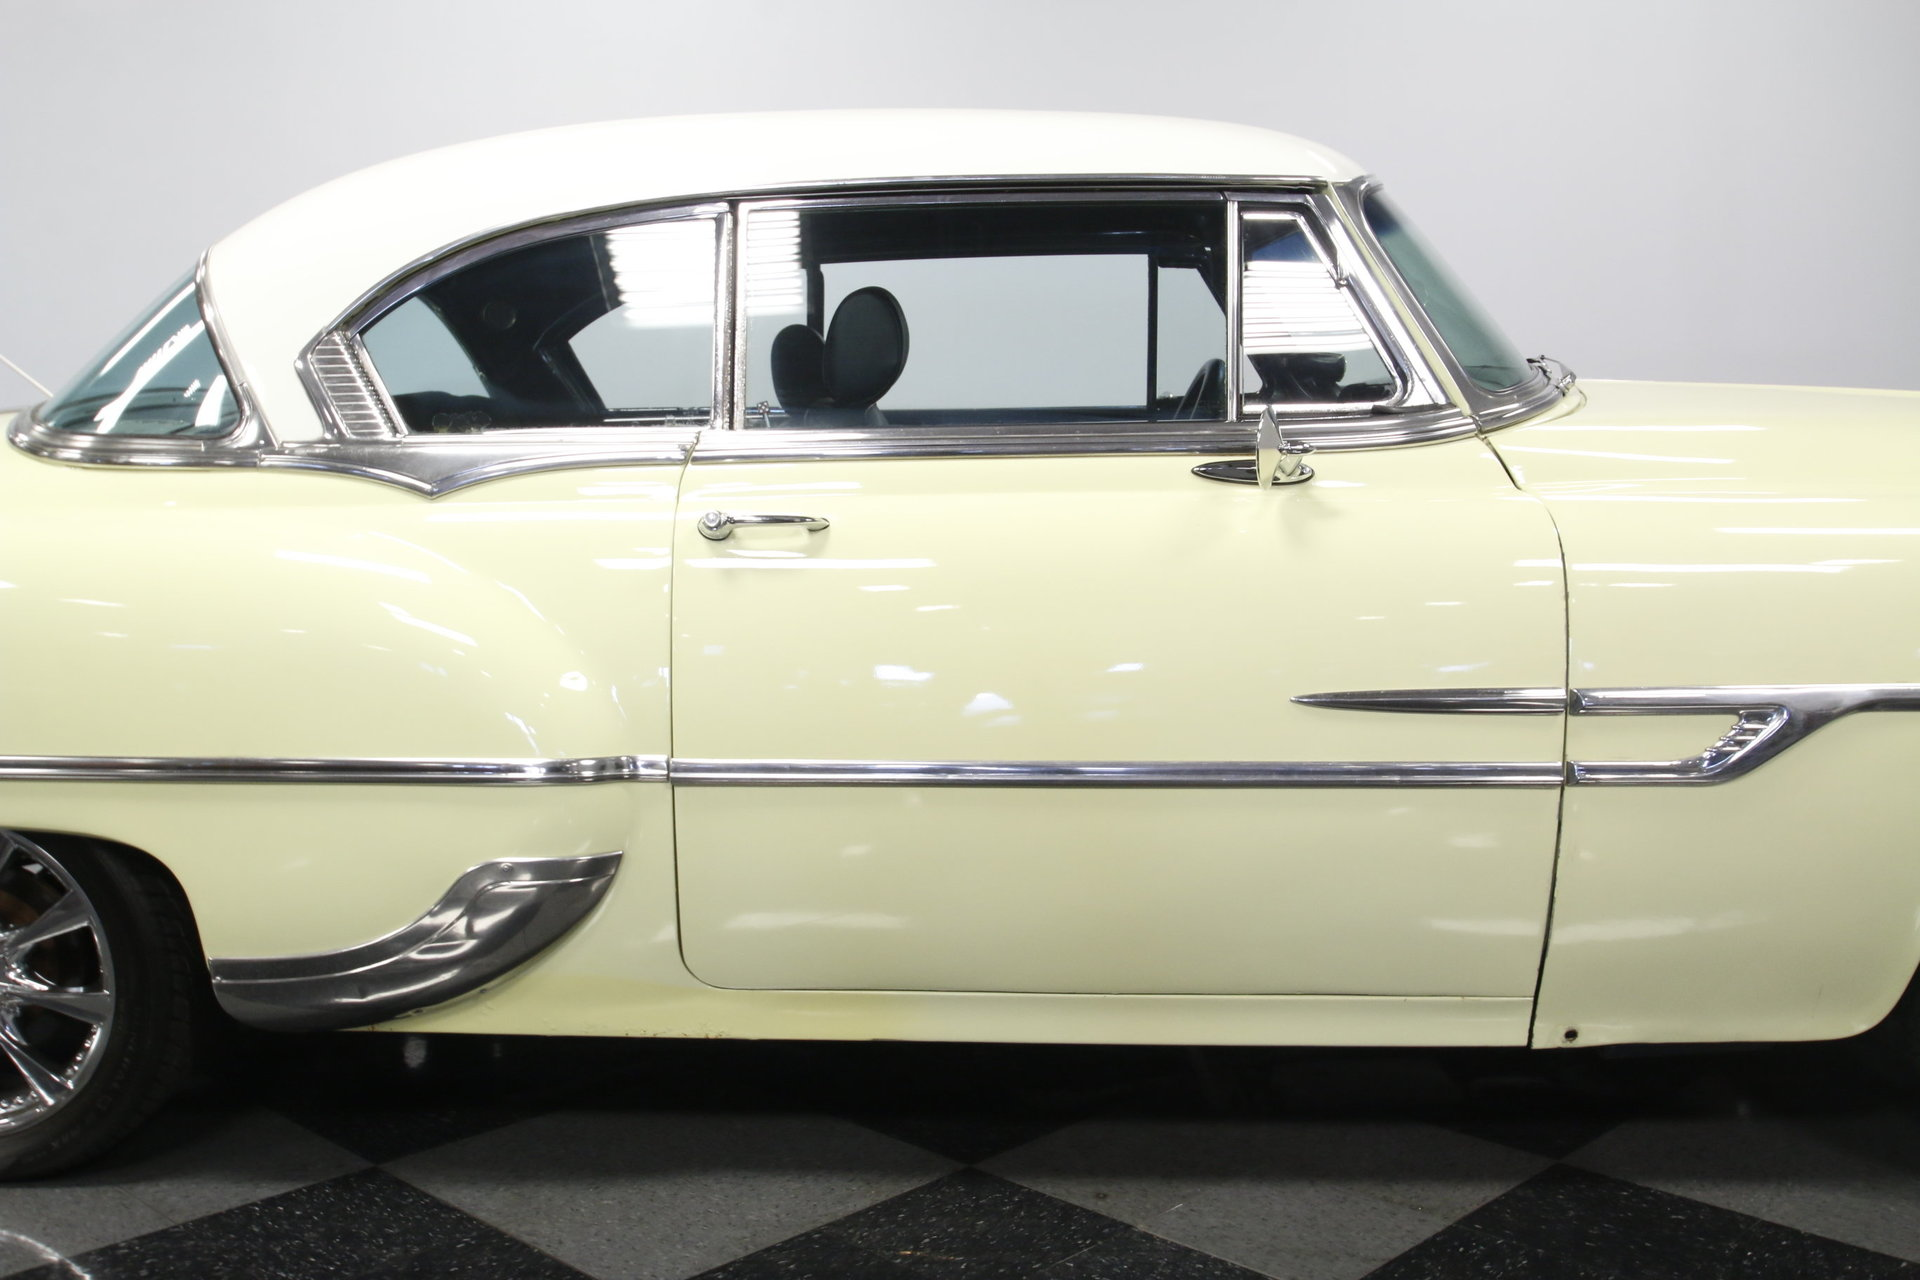 1953 Pontiac Chieftain Streetside Classics The Nations Trusted Sedan View 360